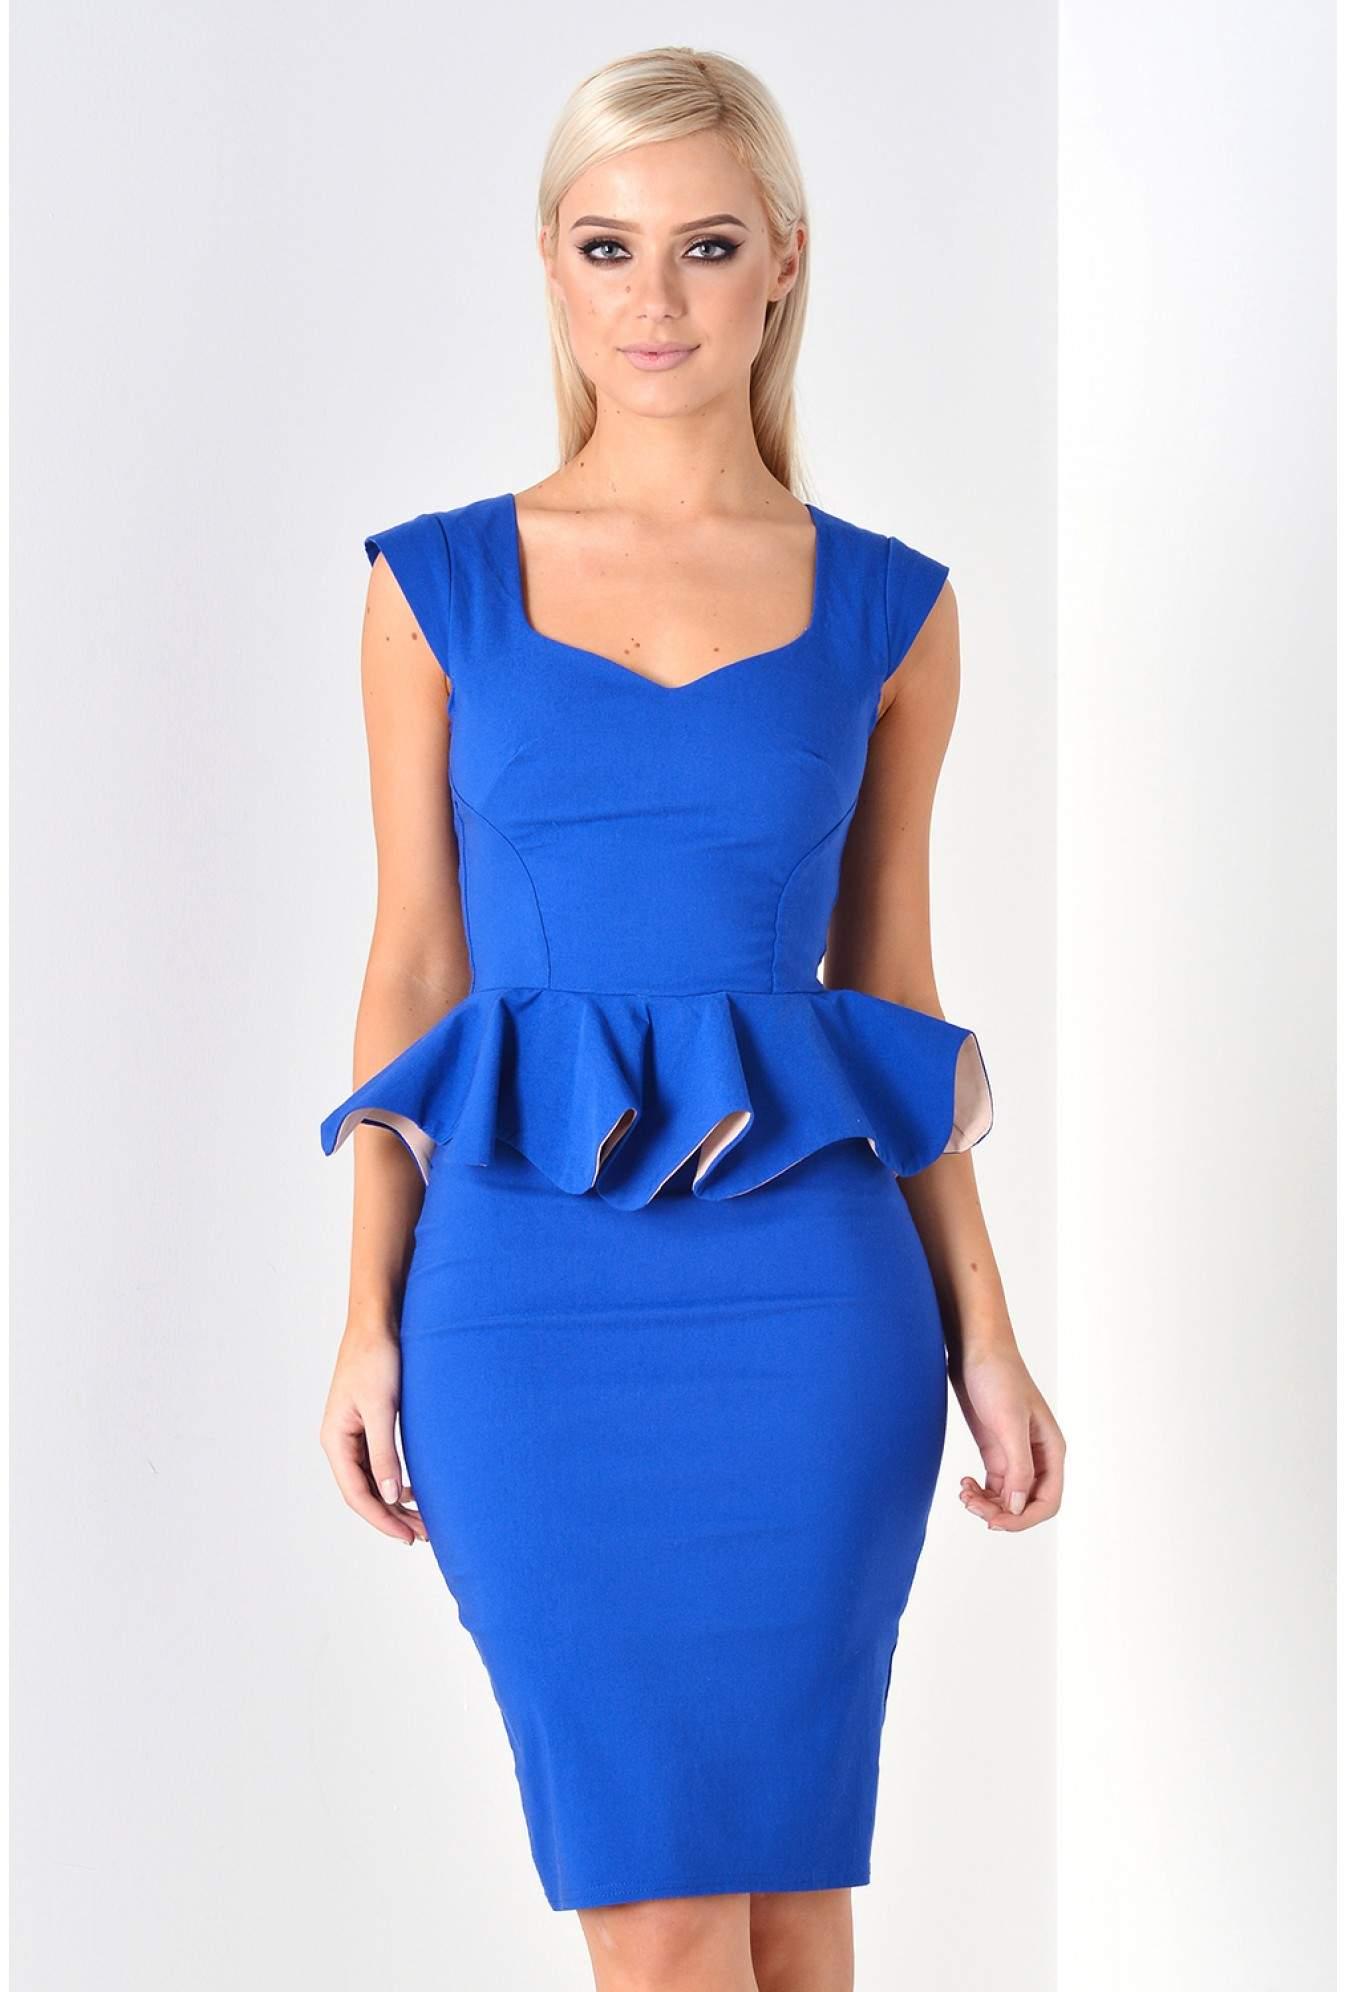 bc77728e7ca Goddiva Linda Frill Peplum Pencil Dress in Royal Blue